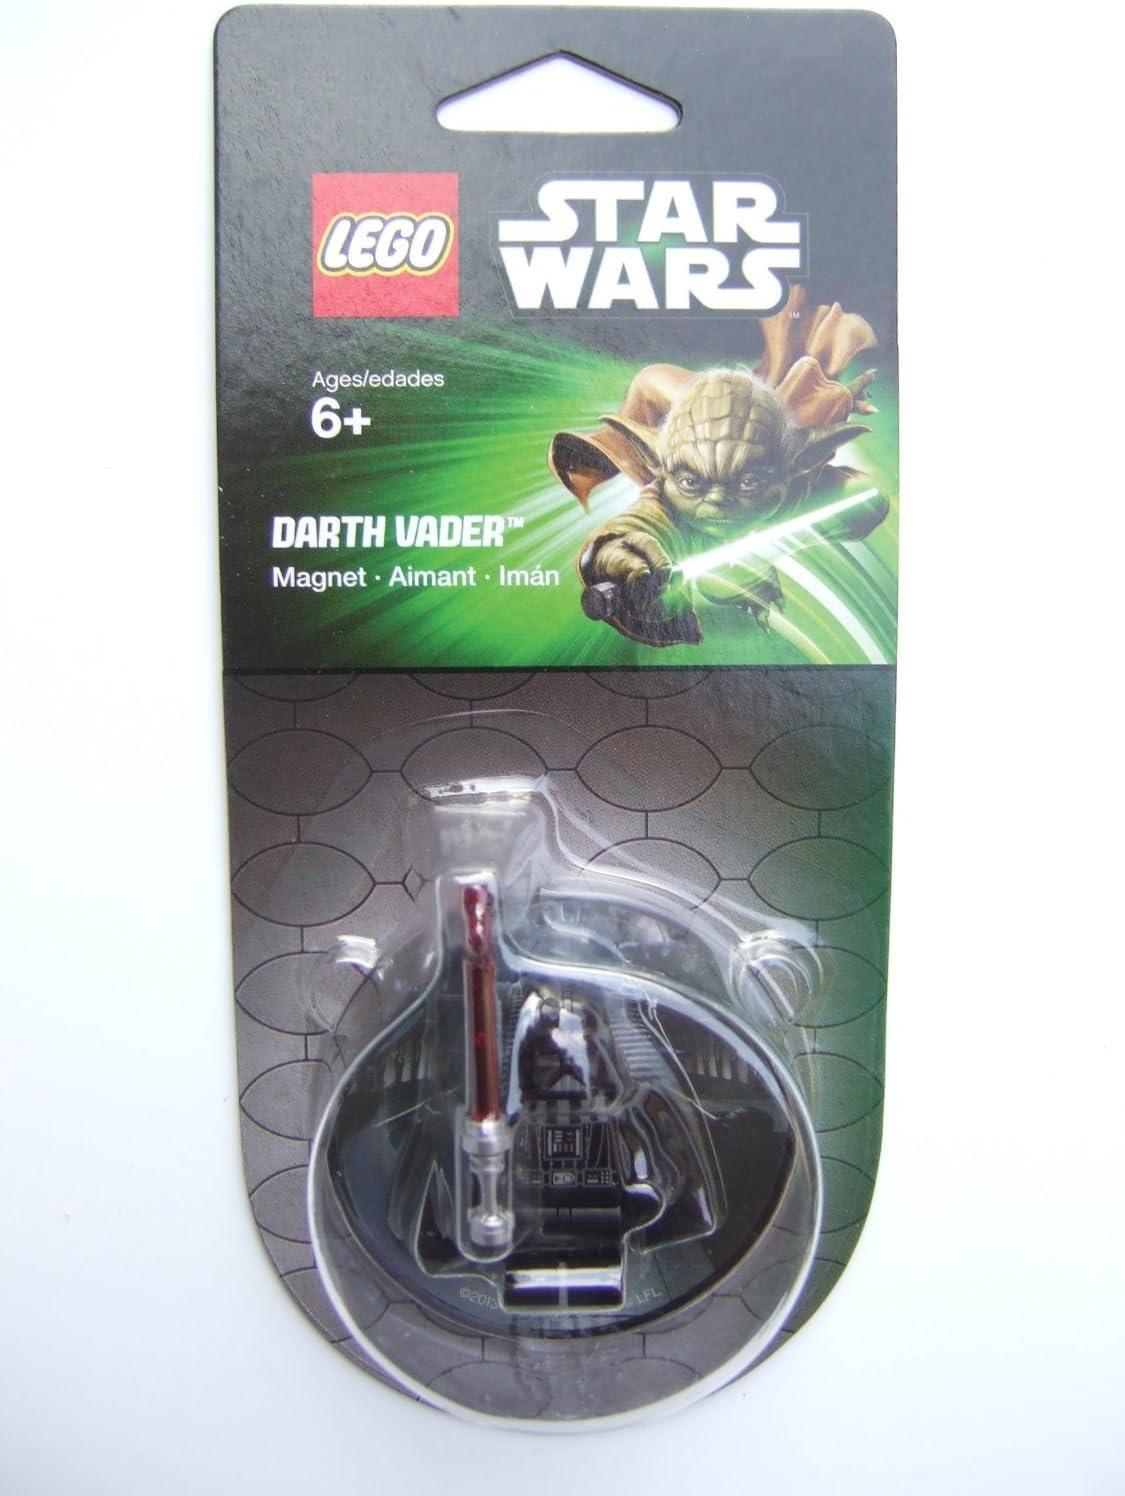 LEGO Star Wars Darth Vader Magnet